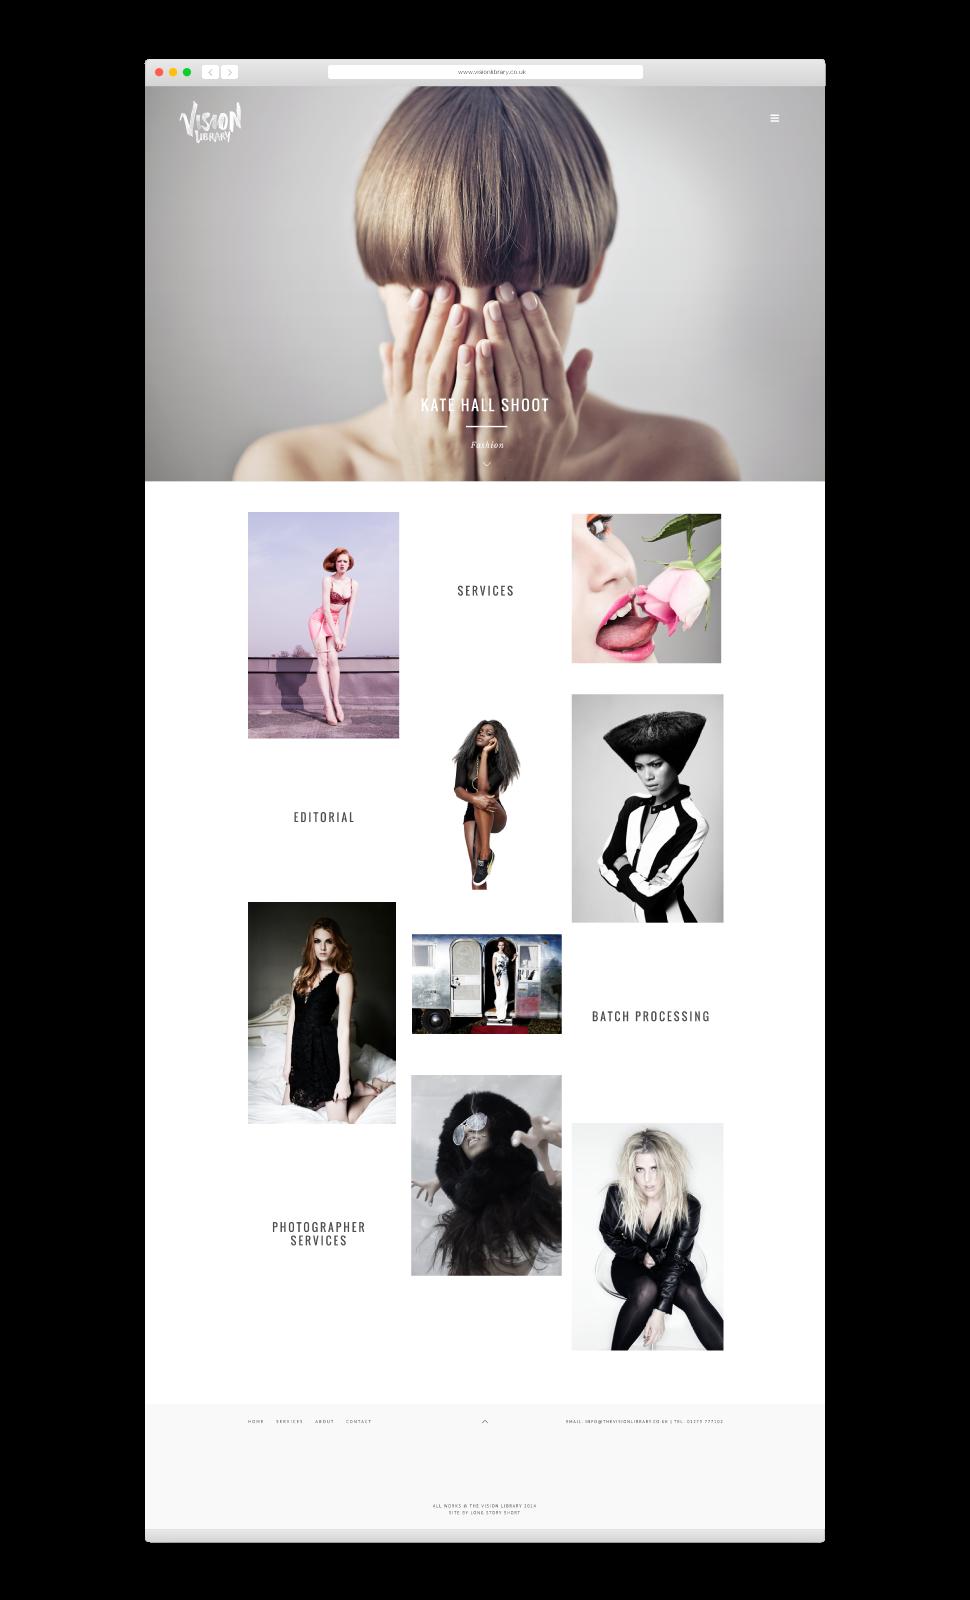 Long Story Short Digital Creative Agency Wordpress Website Design Visions